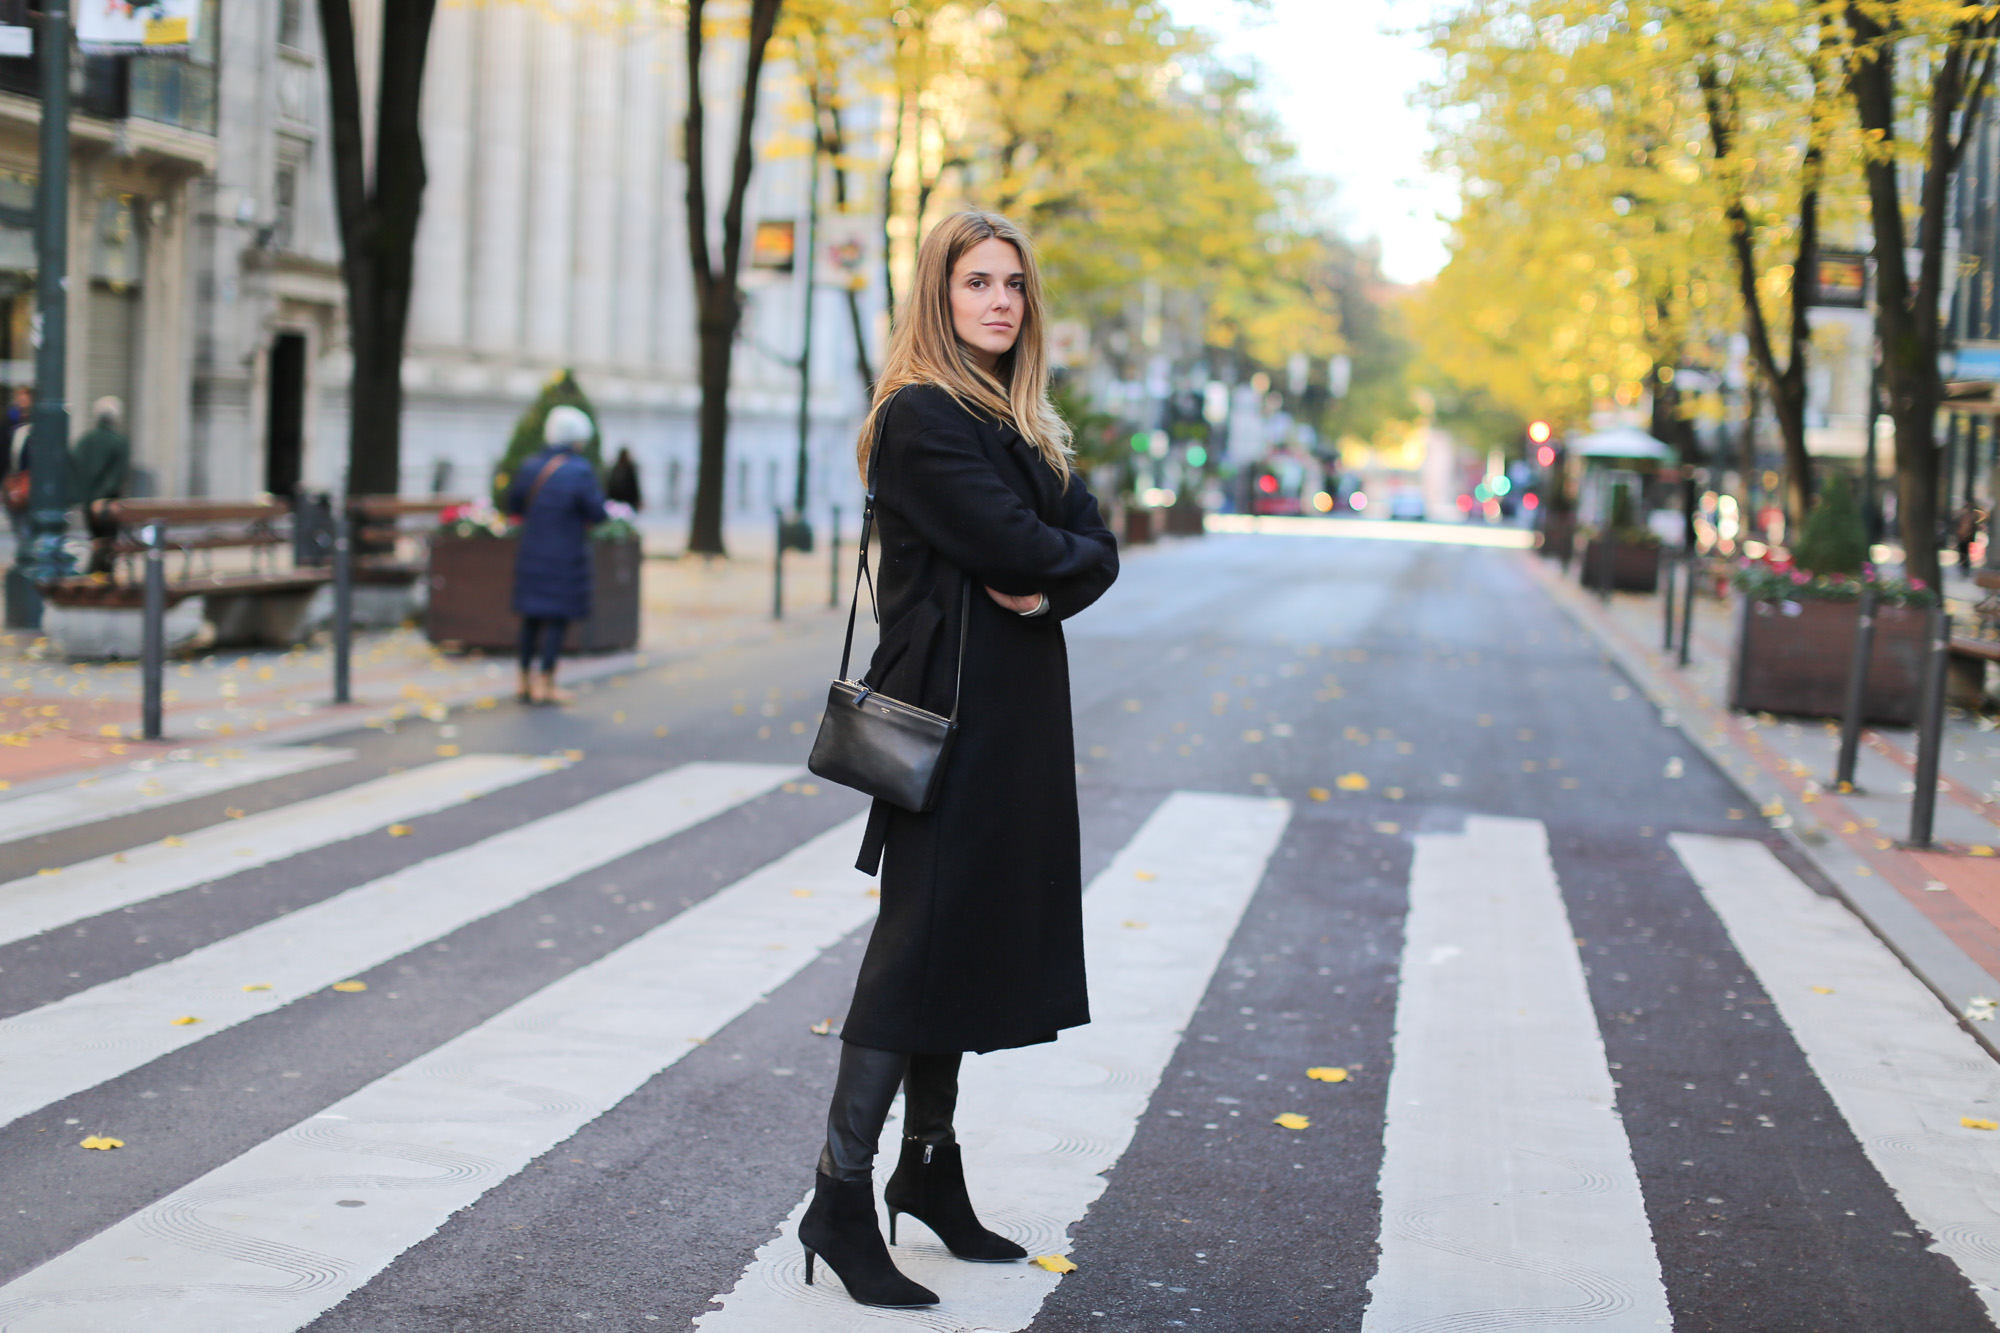 Clochet_fashionblogger_streetstyle_claudiepierlot_stripedknit_andotherstories_suedestilettoankleboots_coslongwoolcoat-3